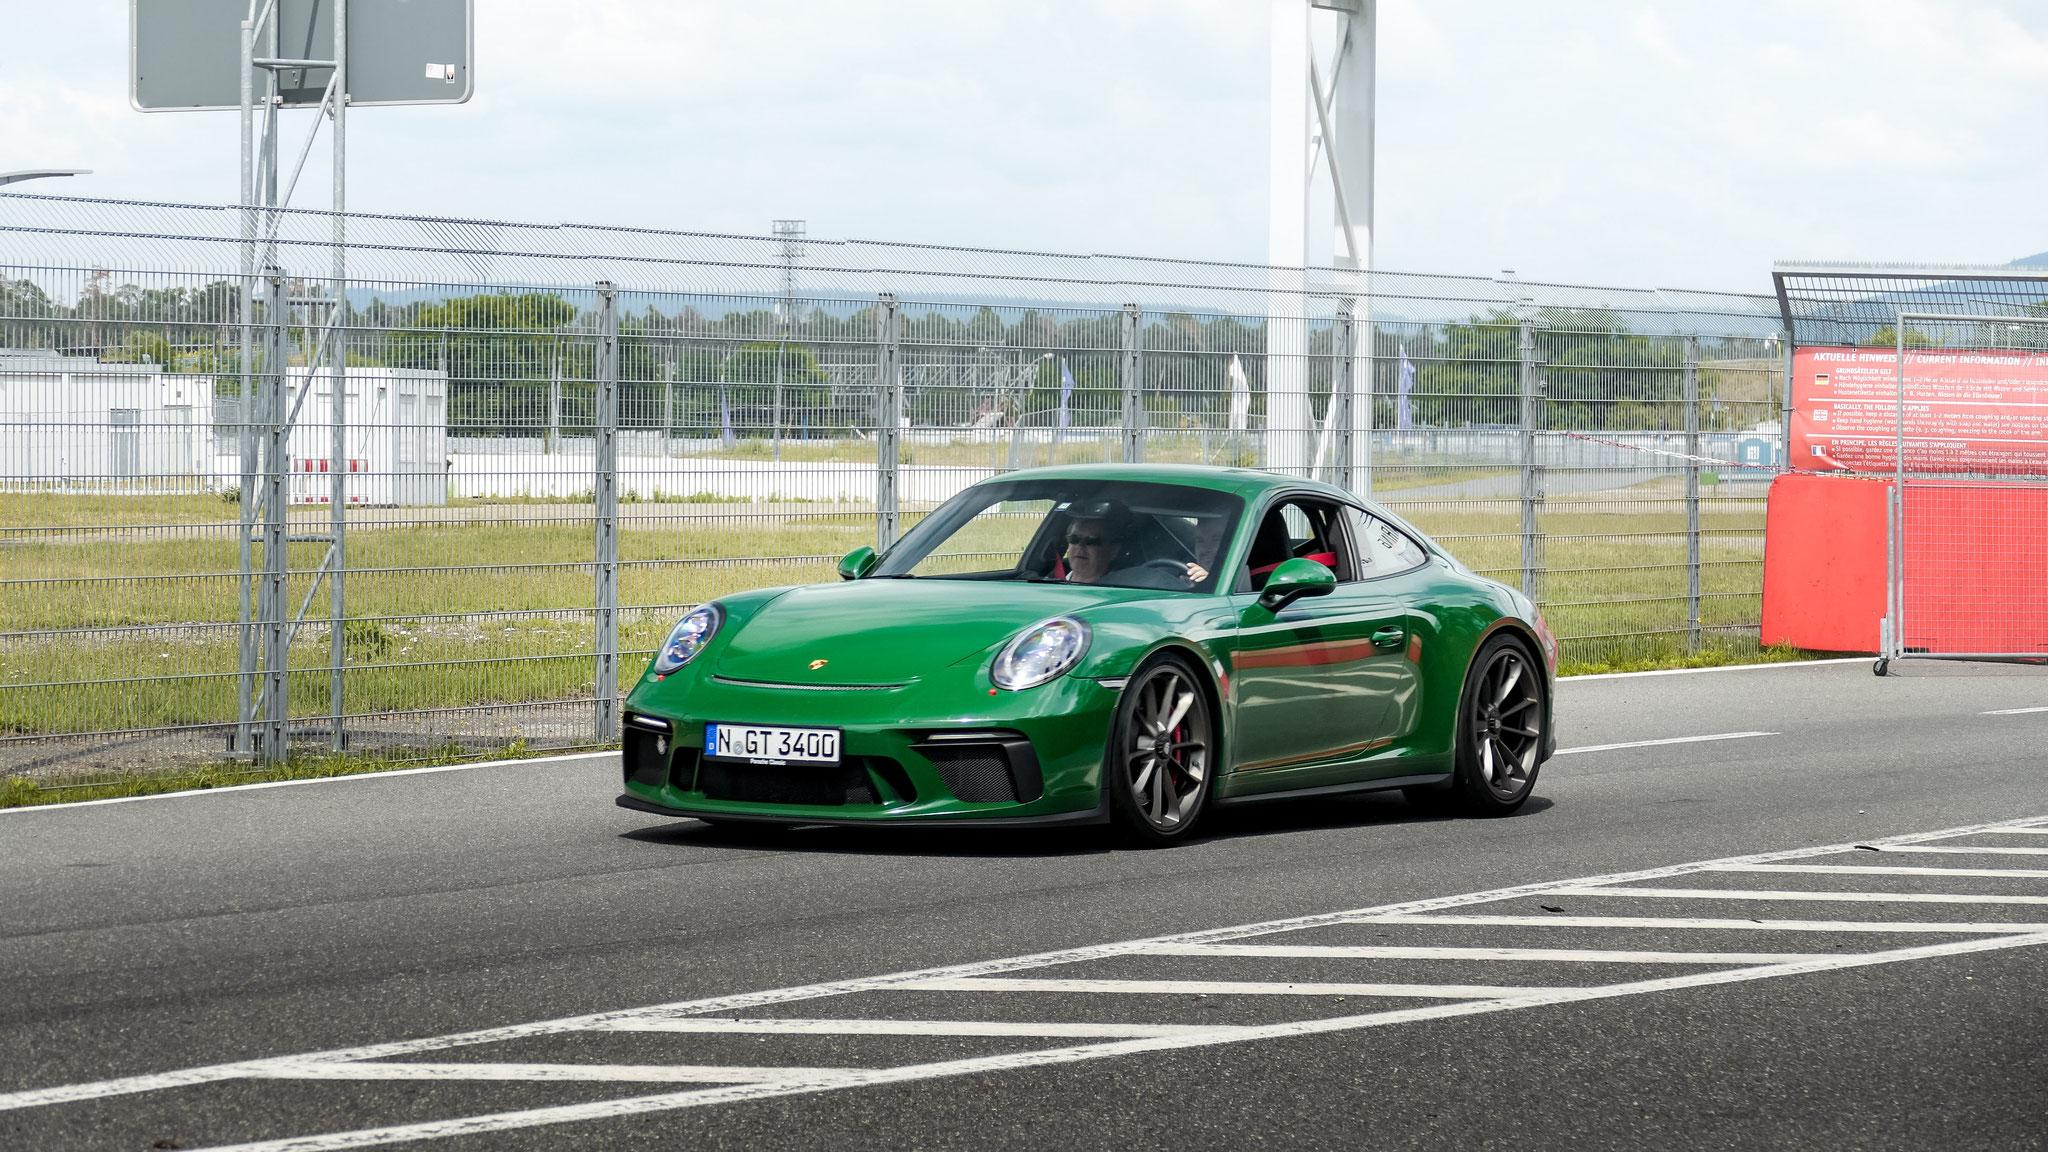 Porsche 991 GT3 Touring Package - N-GT-3400